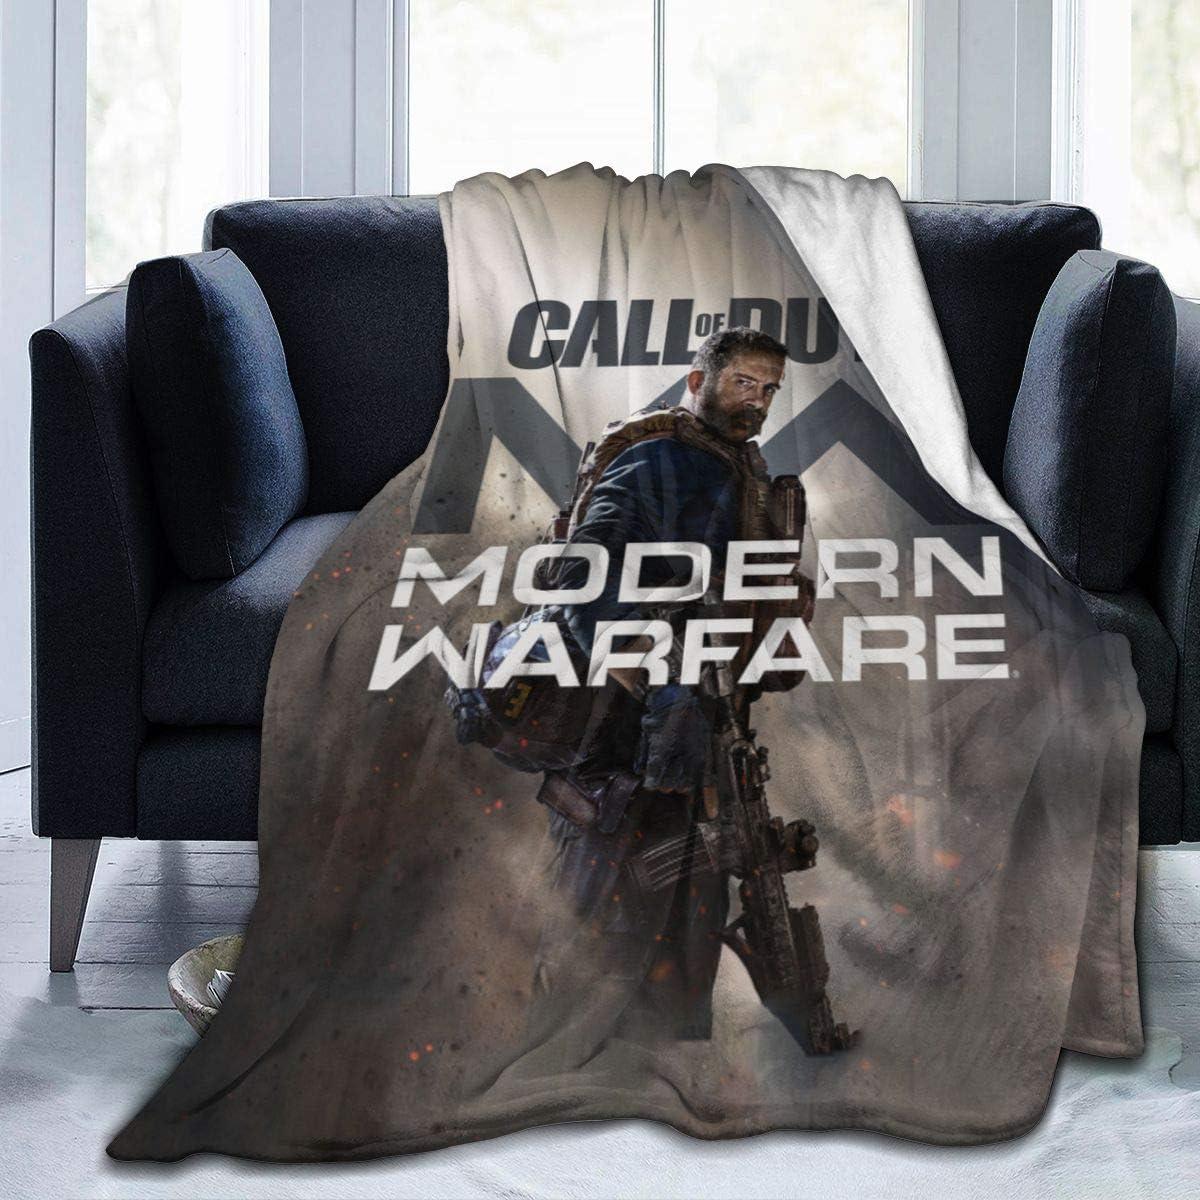 12. Call-of-Duty Modern-Warfare Warm 3D Printed Throw Blanket